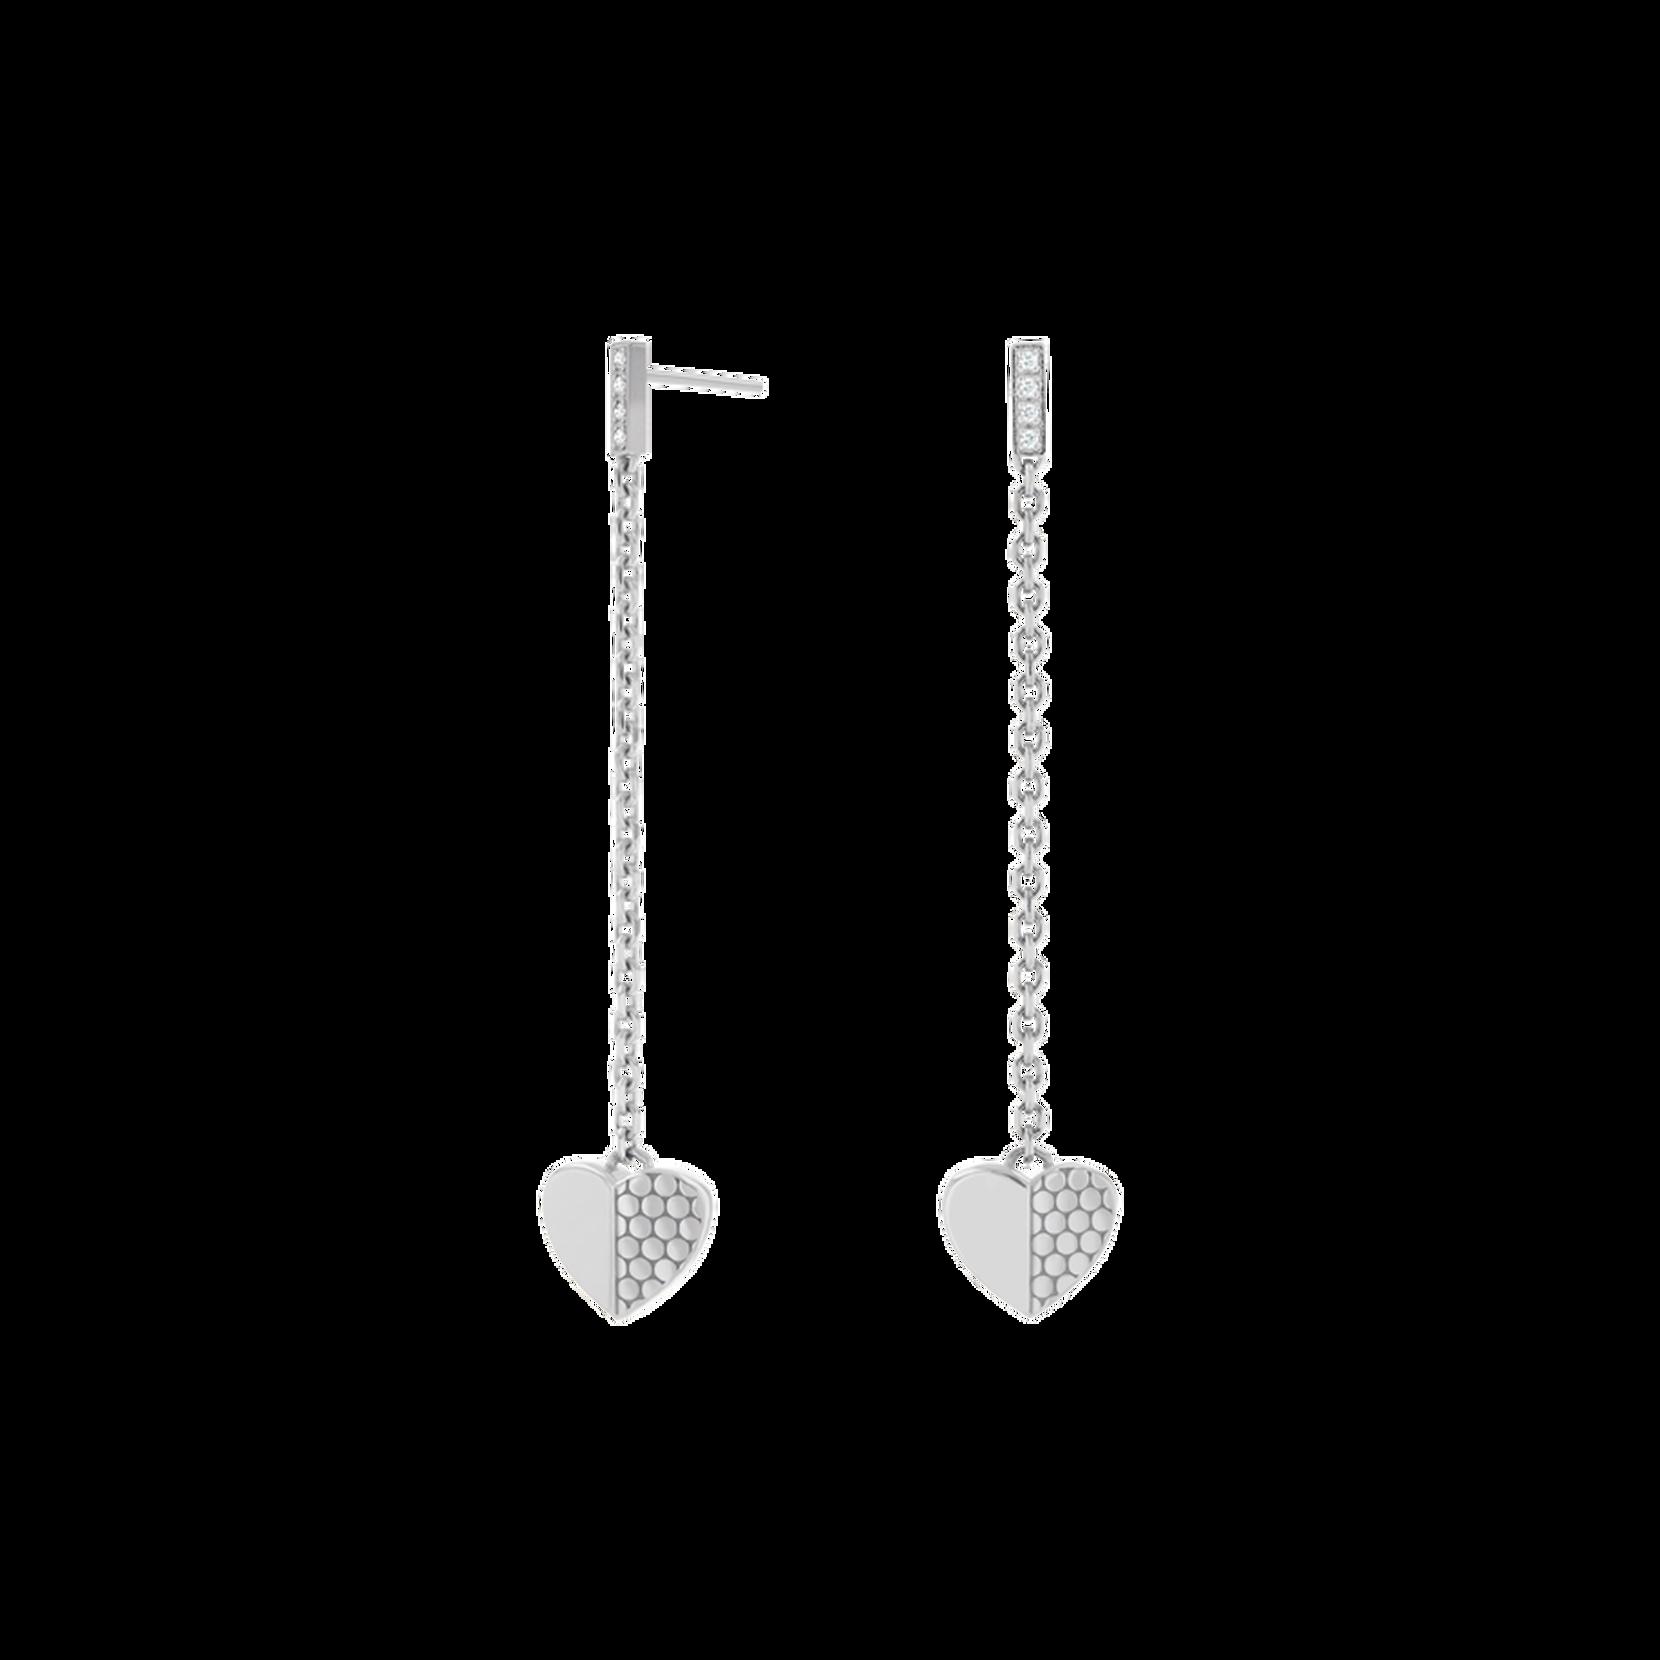 Movado Heart Charm & Diamond Drop Earrings